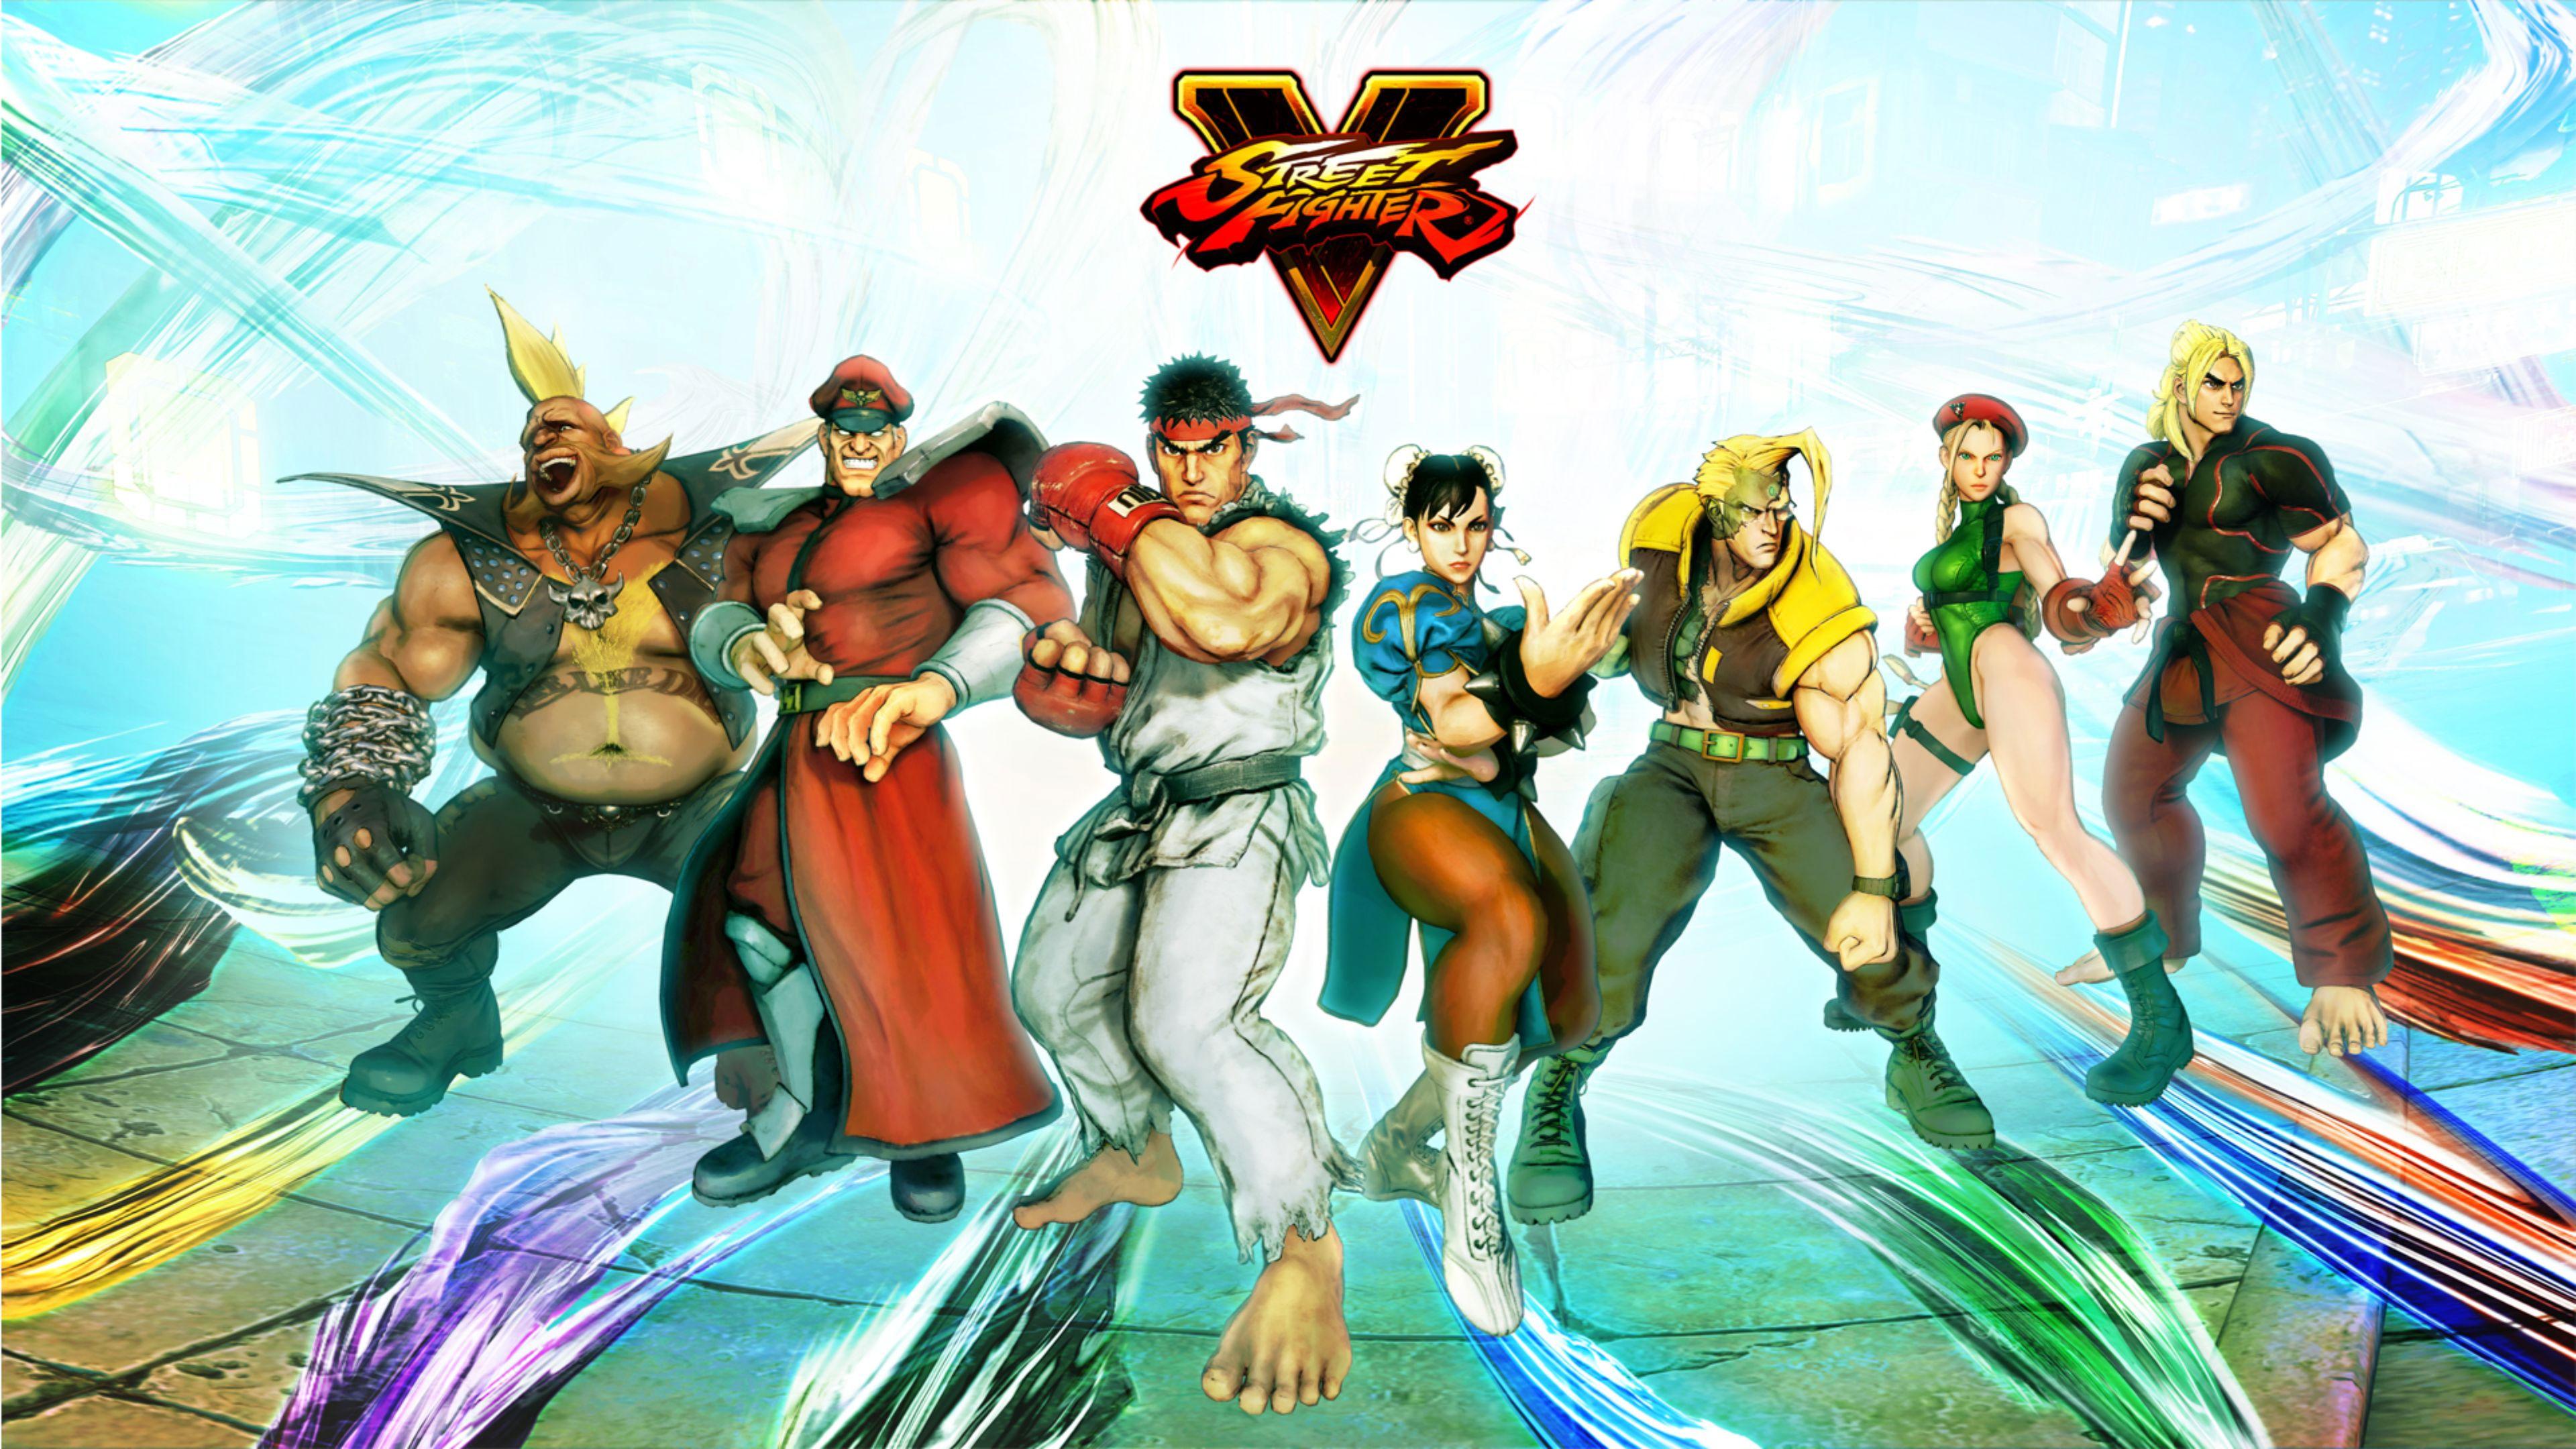 Street Fighter V Wallpapers in Ultra HD | 4K